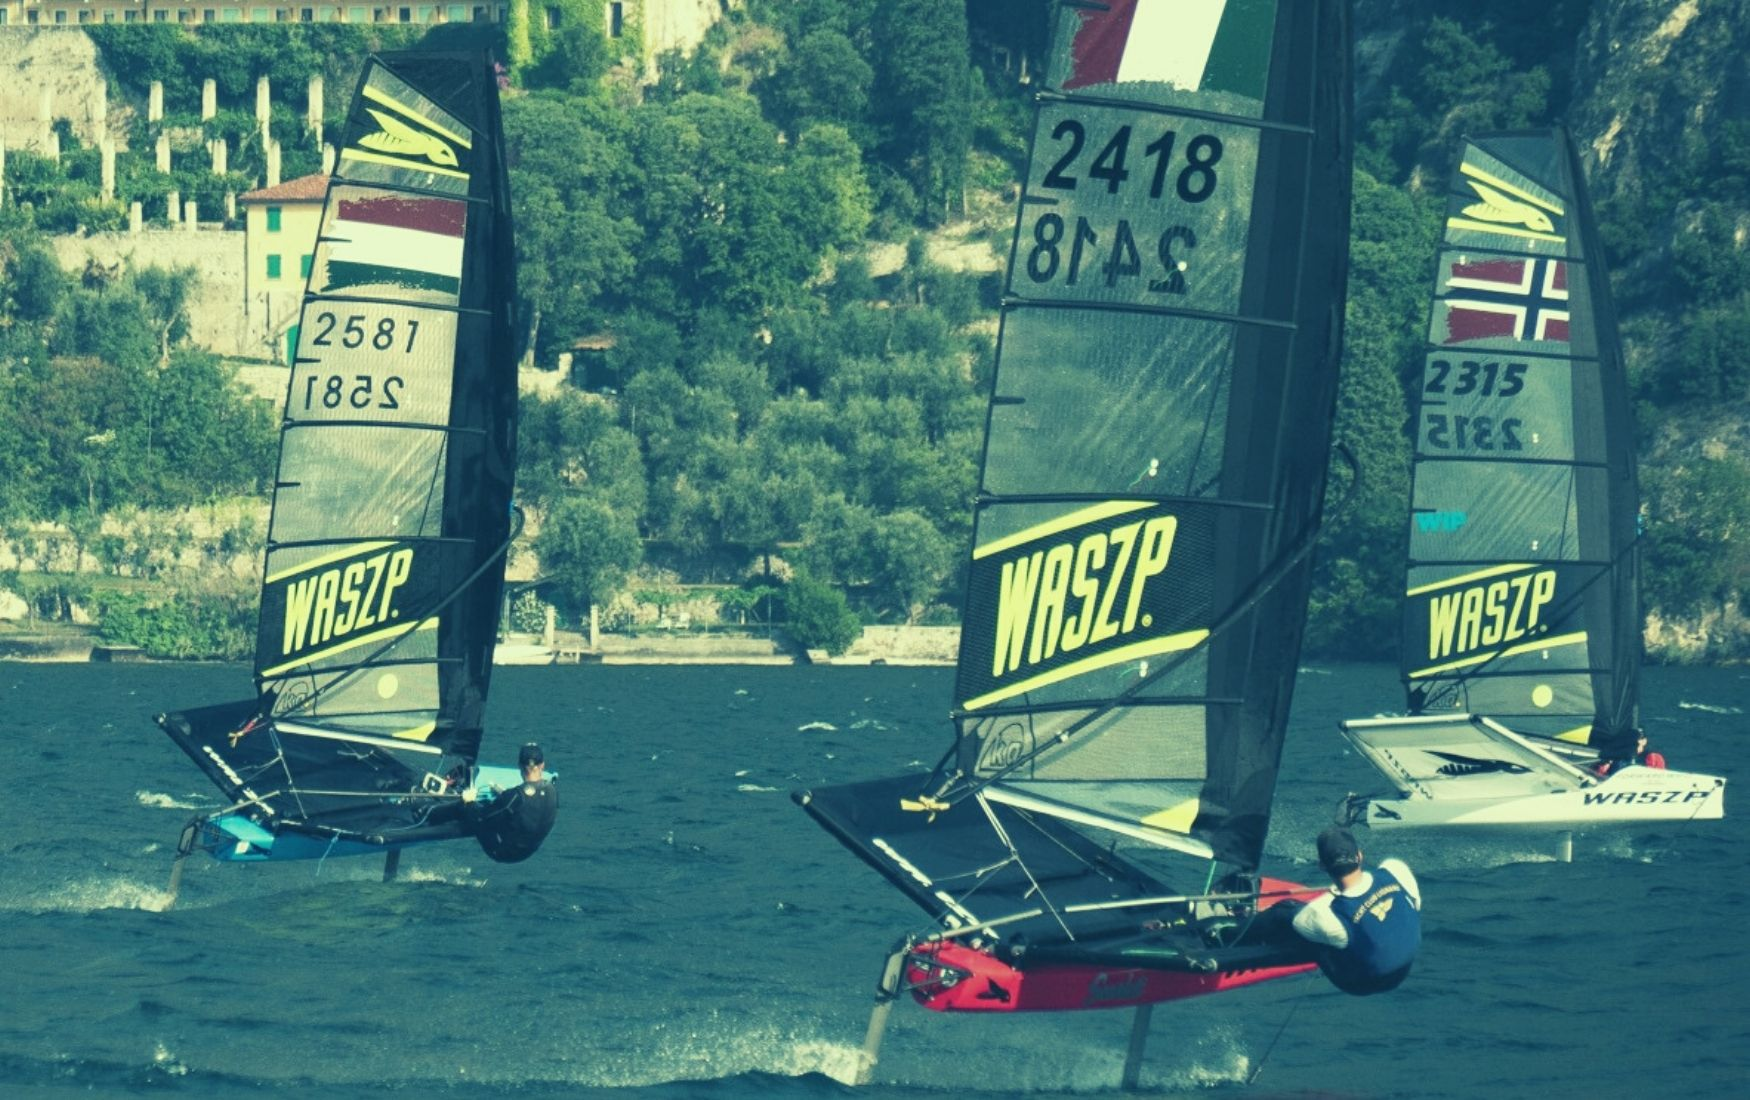 WASZP + Moth regatta